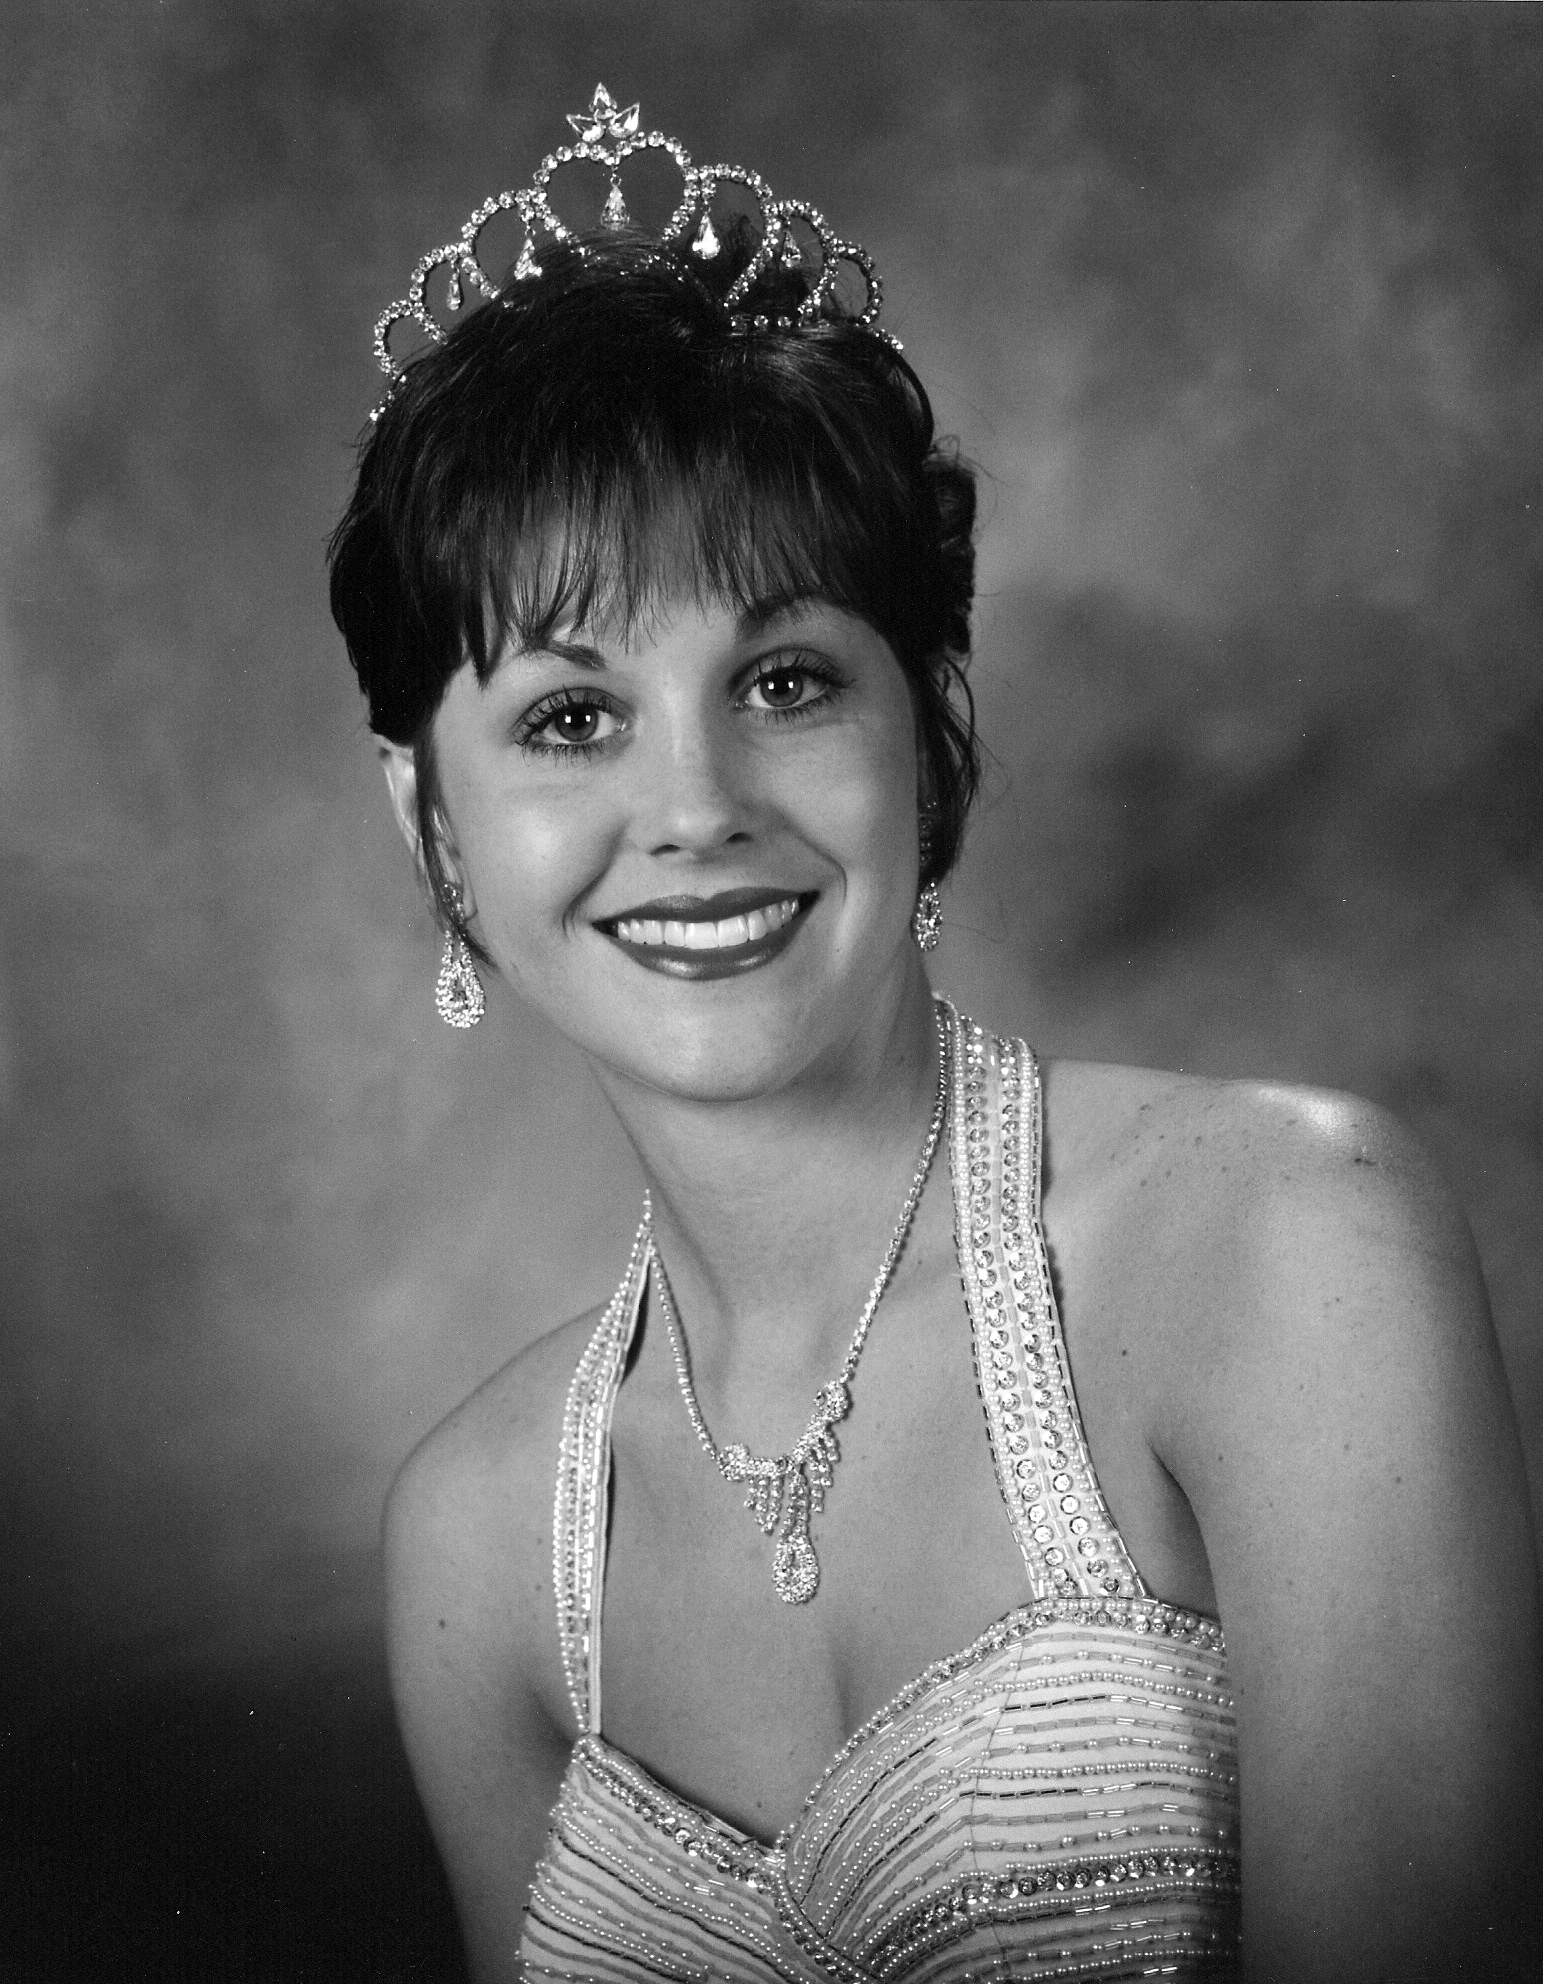 Rani Butcher Miguez - Miss Buna 1998